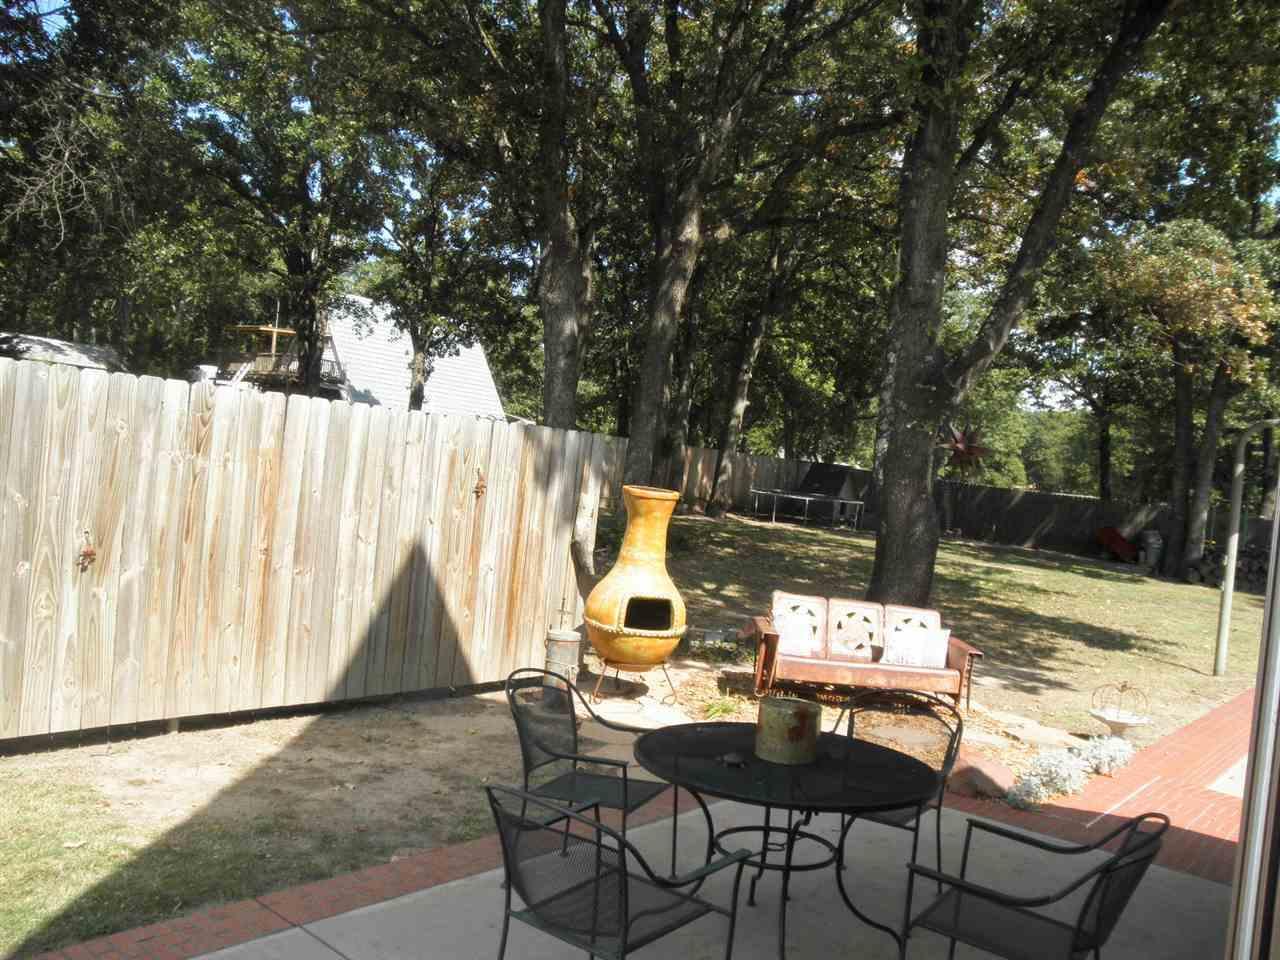 Sold Cross Sale W/ MLS | 54 Pike Lane  Ponca City, OK 74604 24